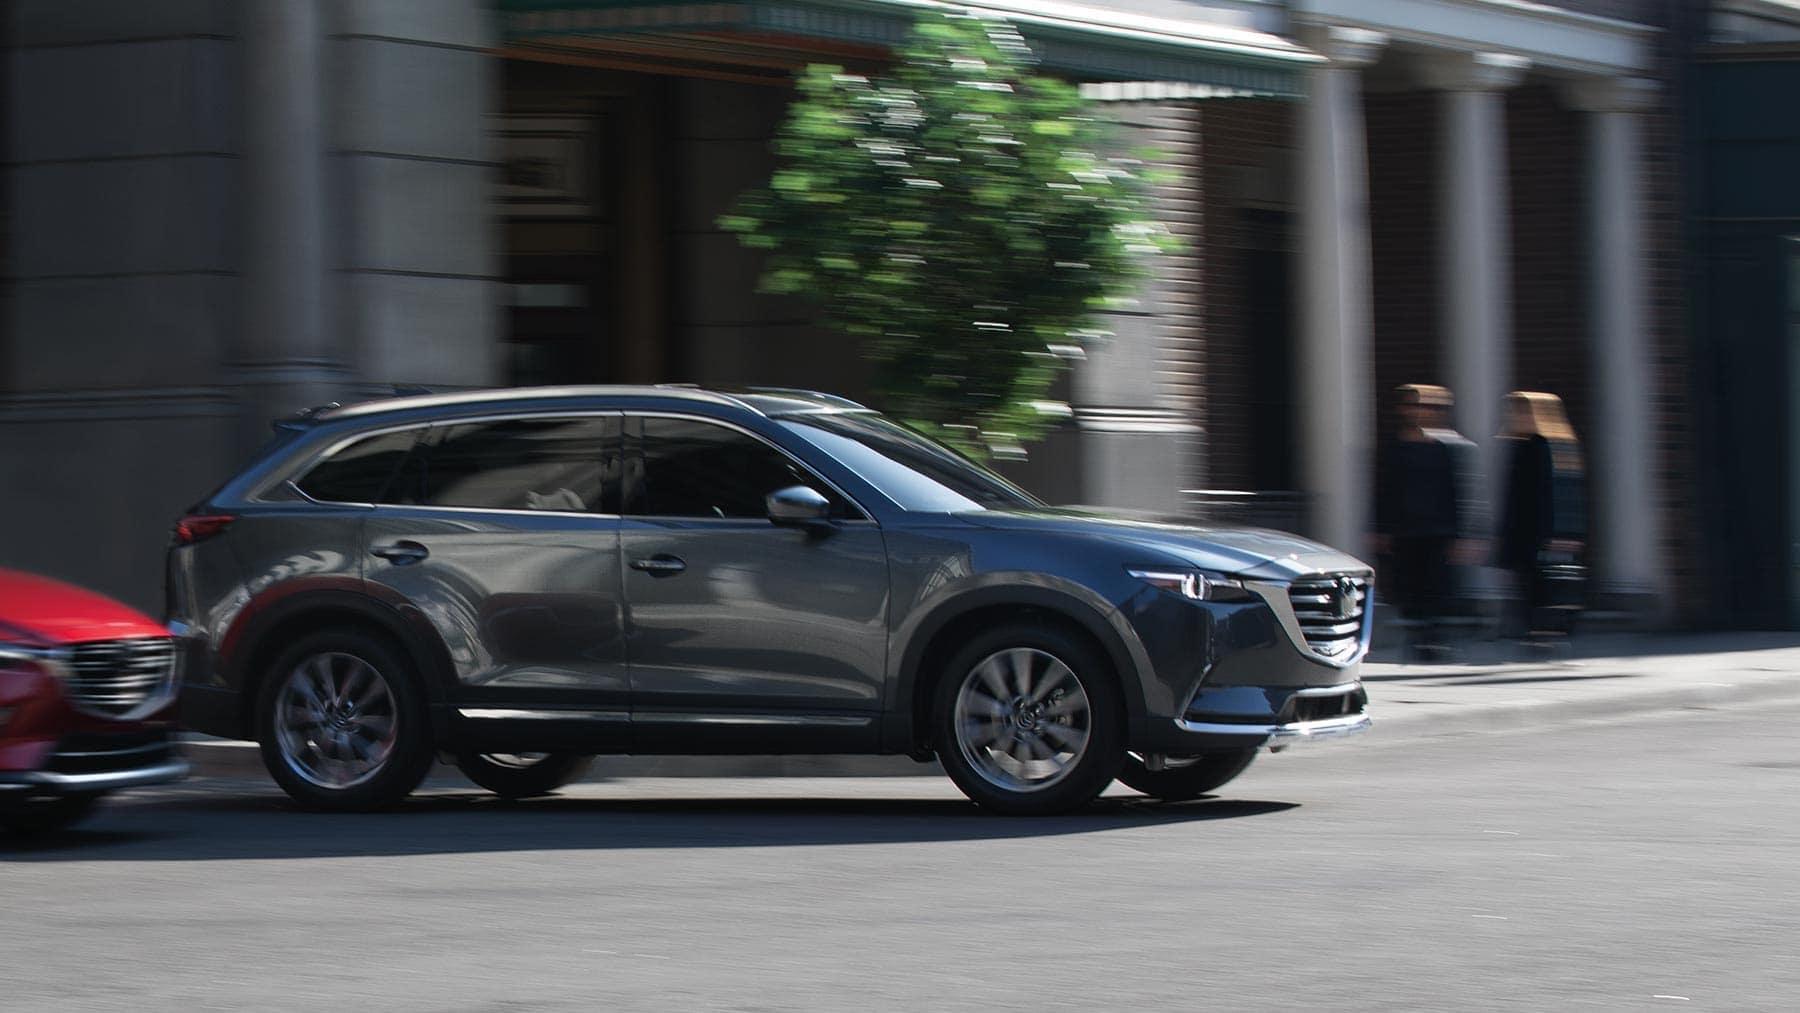 2019 Mazda CX-9 driving down road